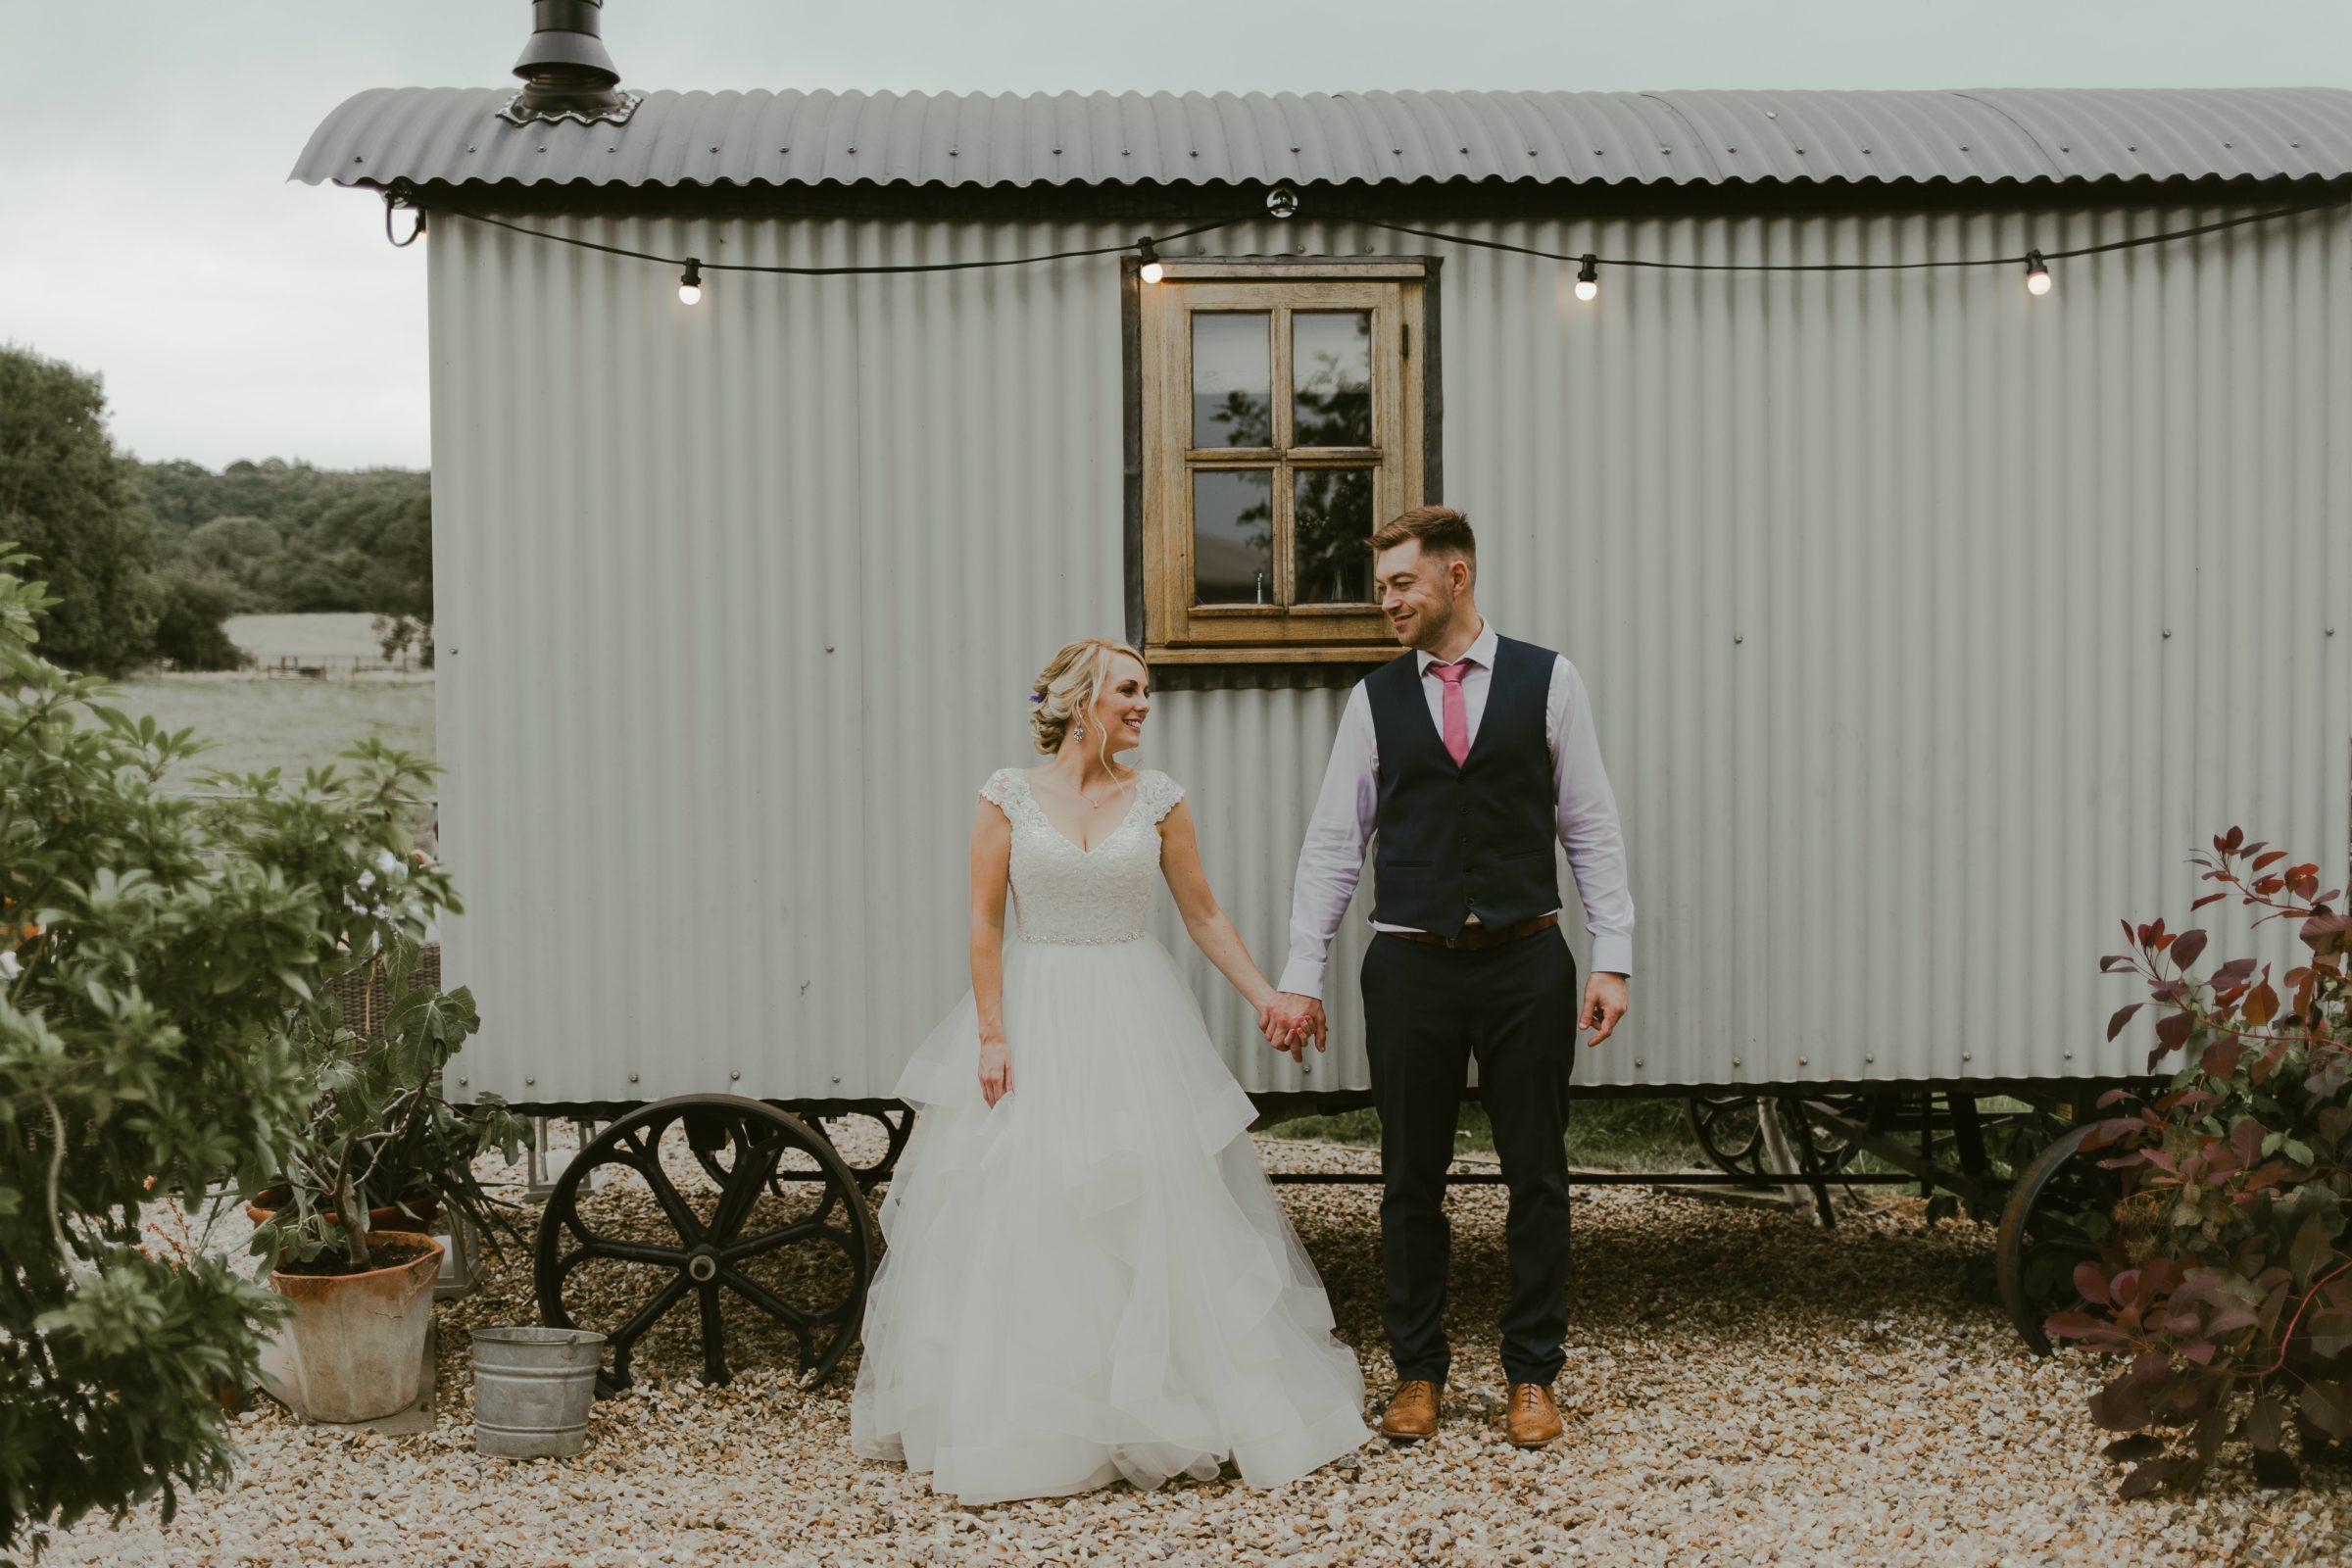 gate-street-barn-wedding-photography-photographer-surrey-uk-summer-weddings